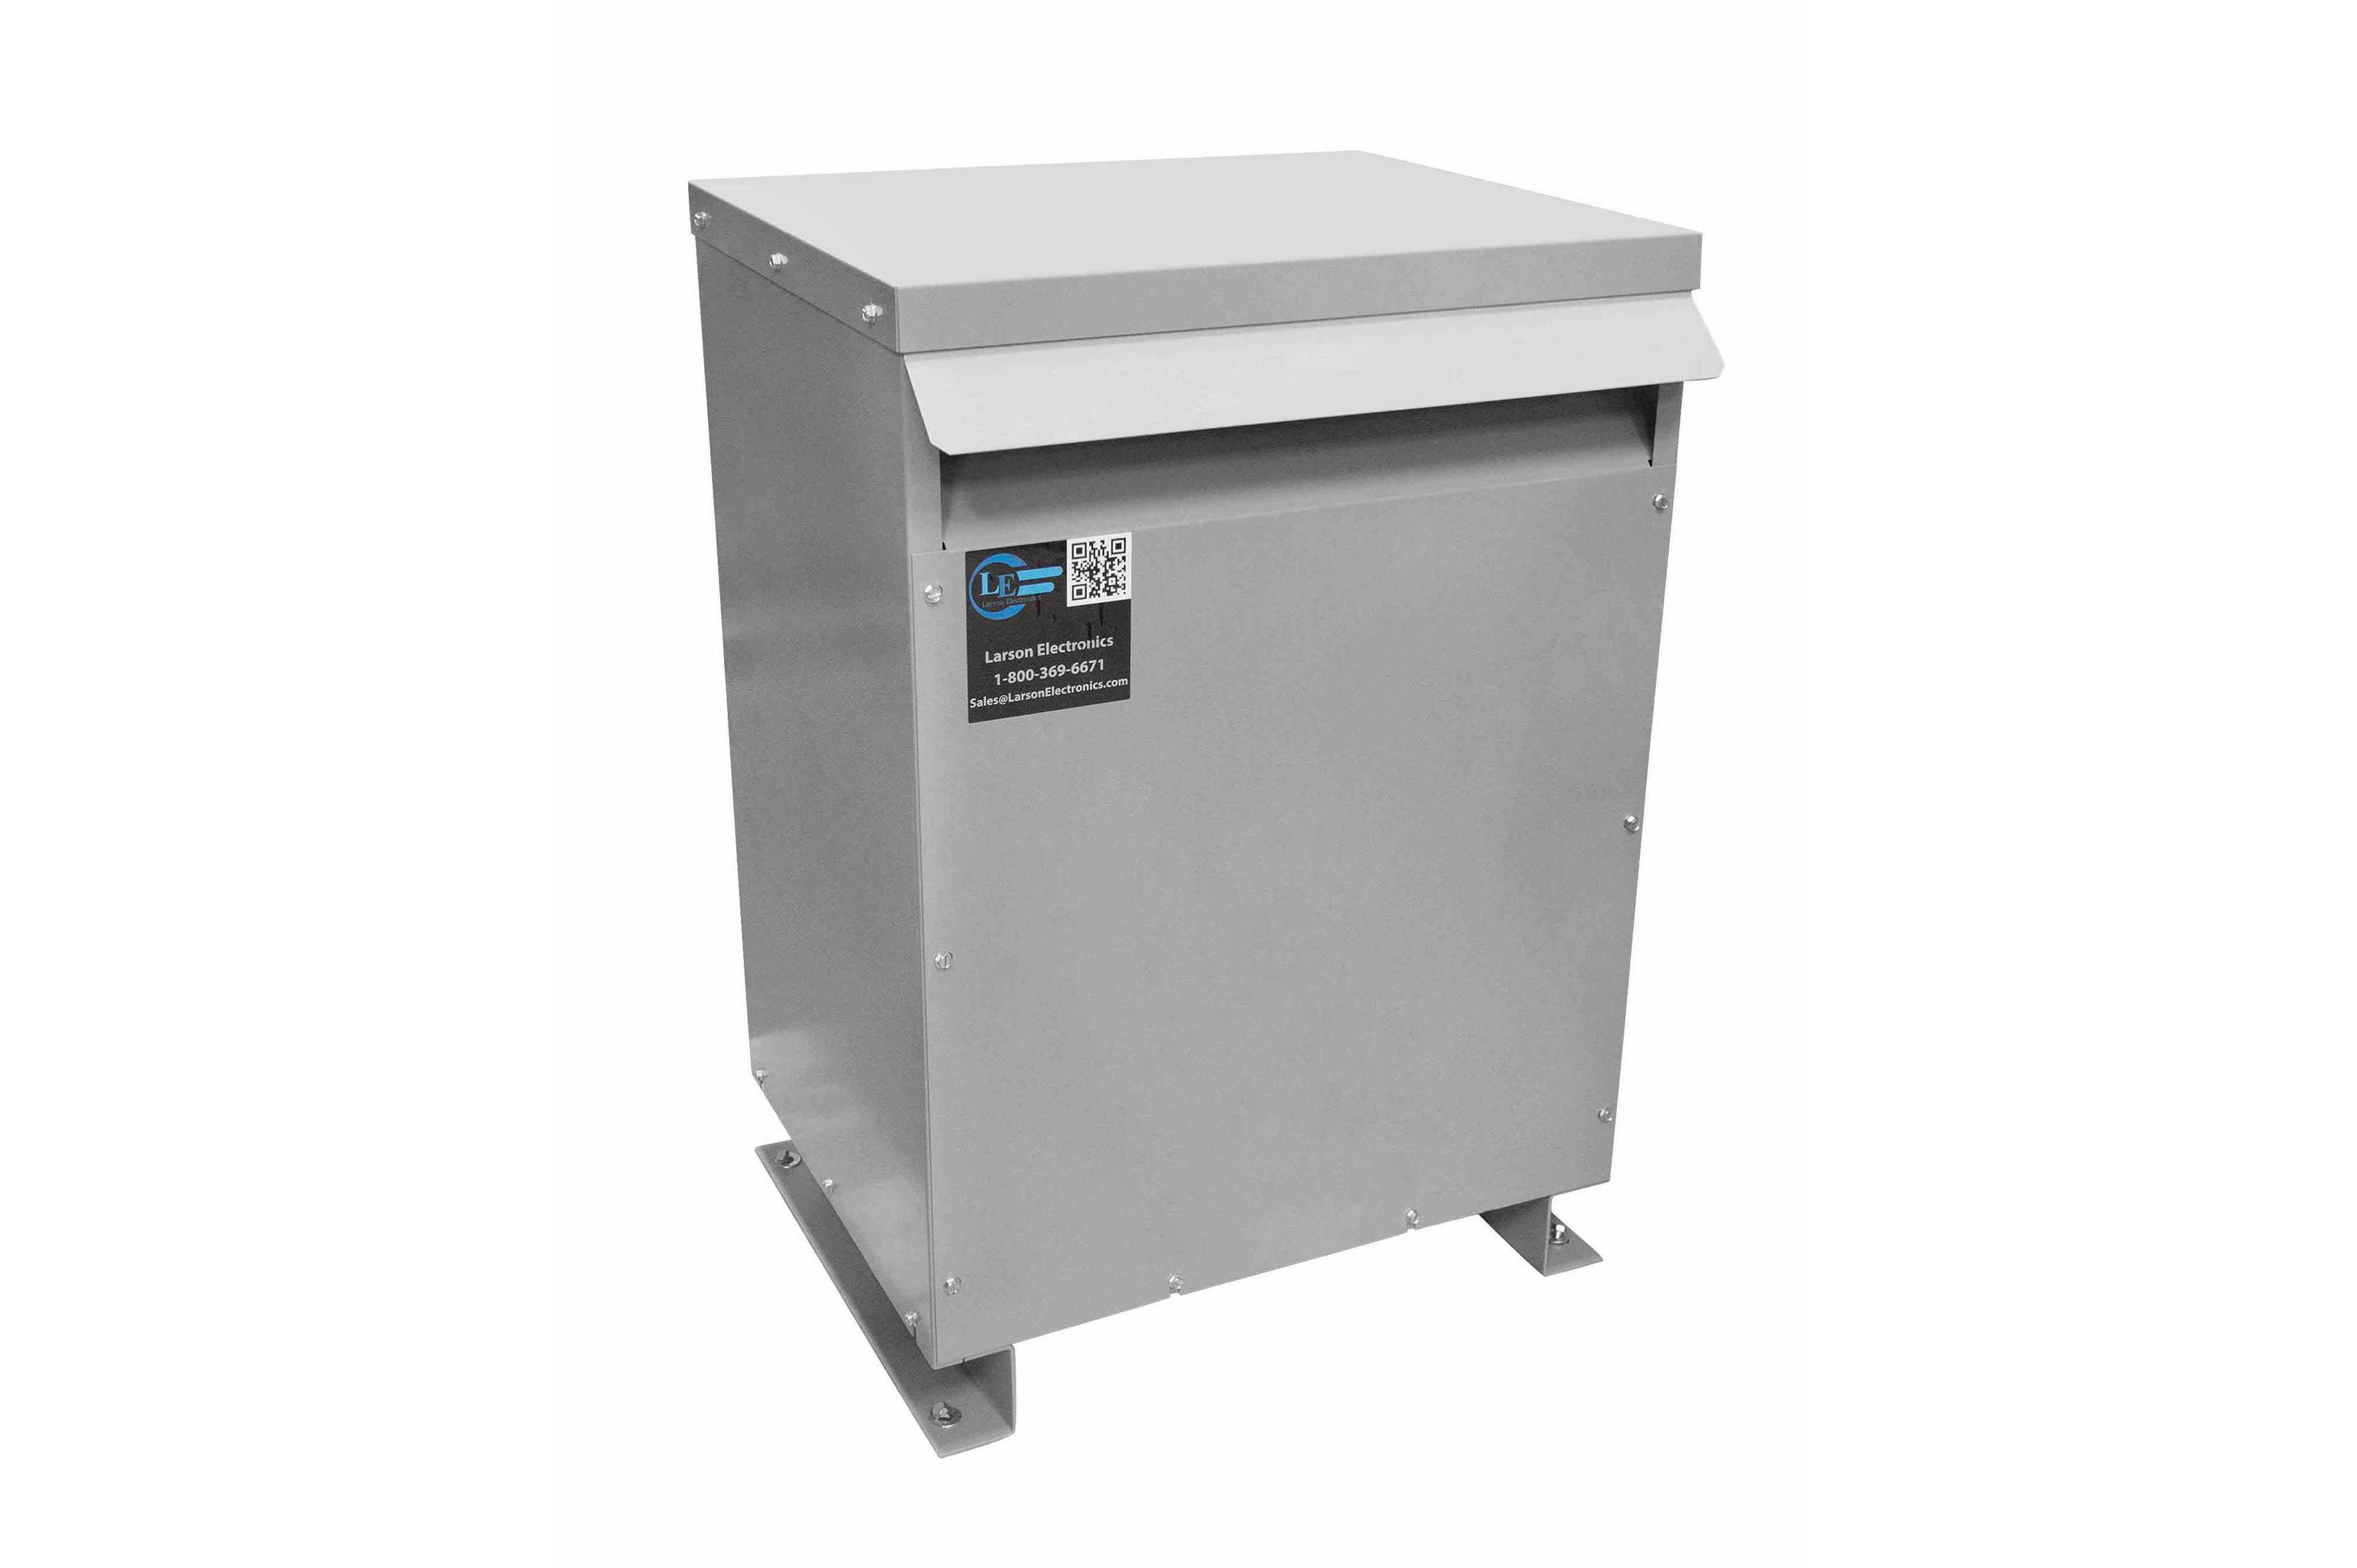 250 kVA 3PH Isolation Transformer, 415V Wye Primary, 480Y/277 Wye-N Secondary, N3R, Ventilated, 60 Hz